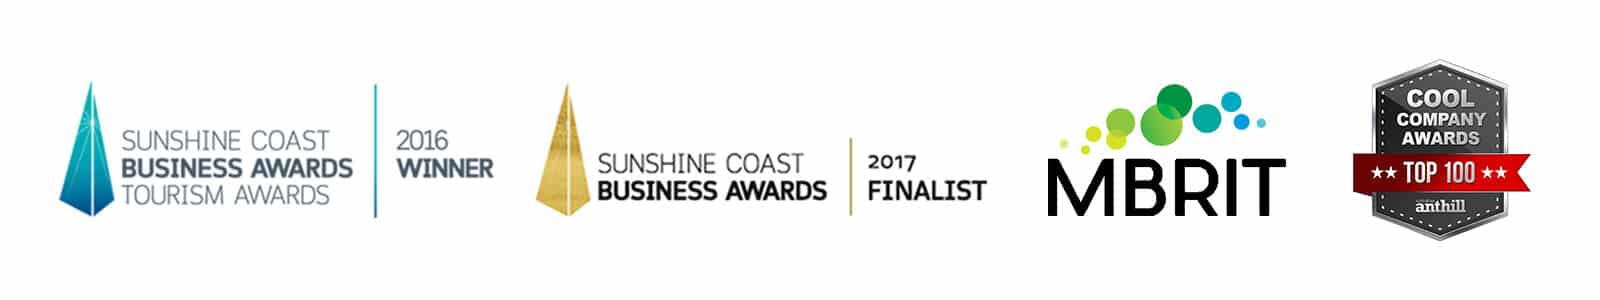 Australian Company Awards Banner